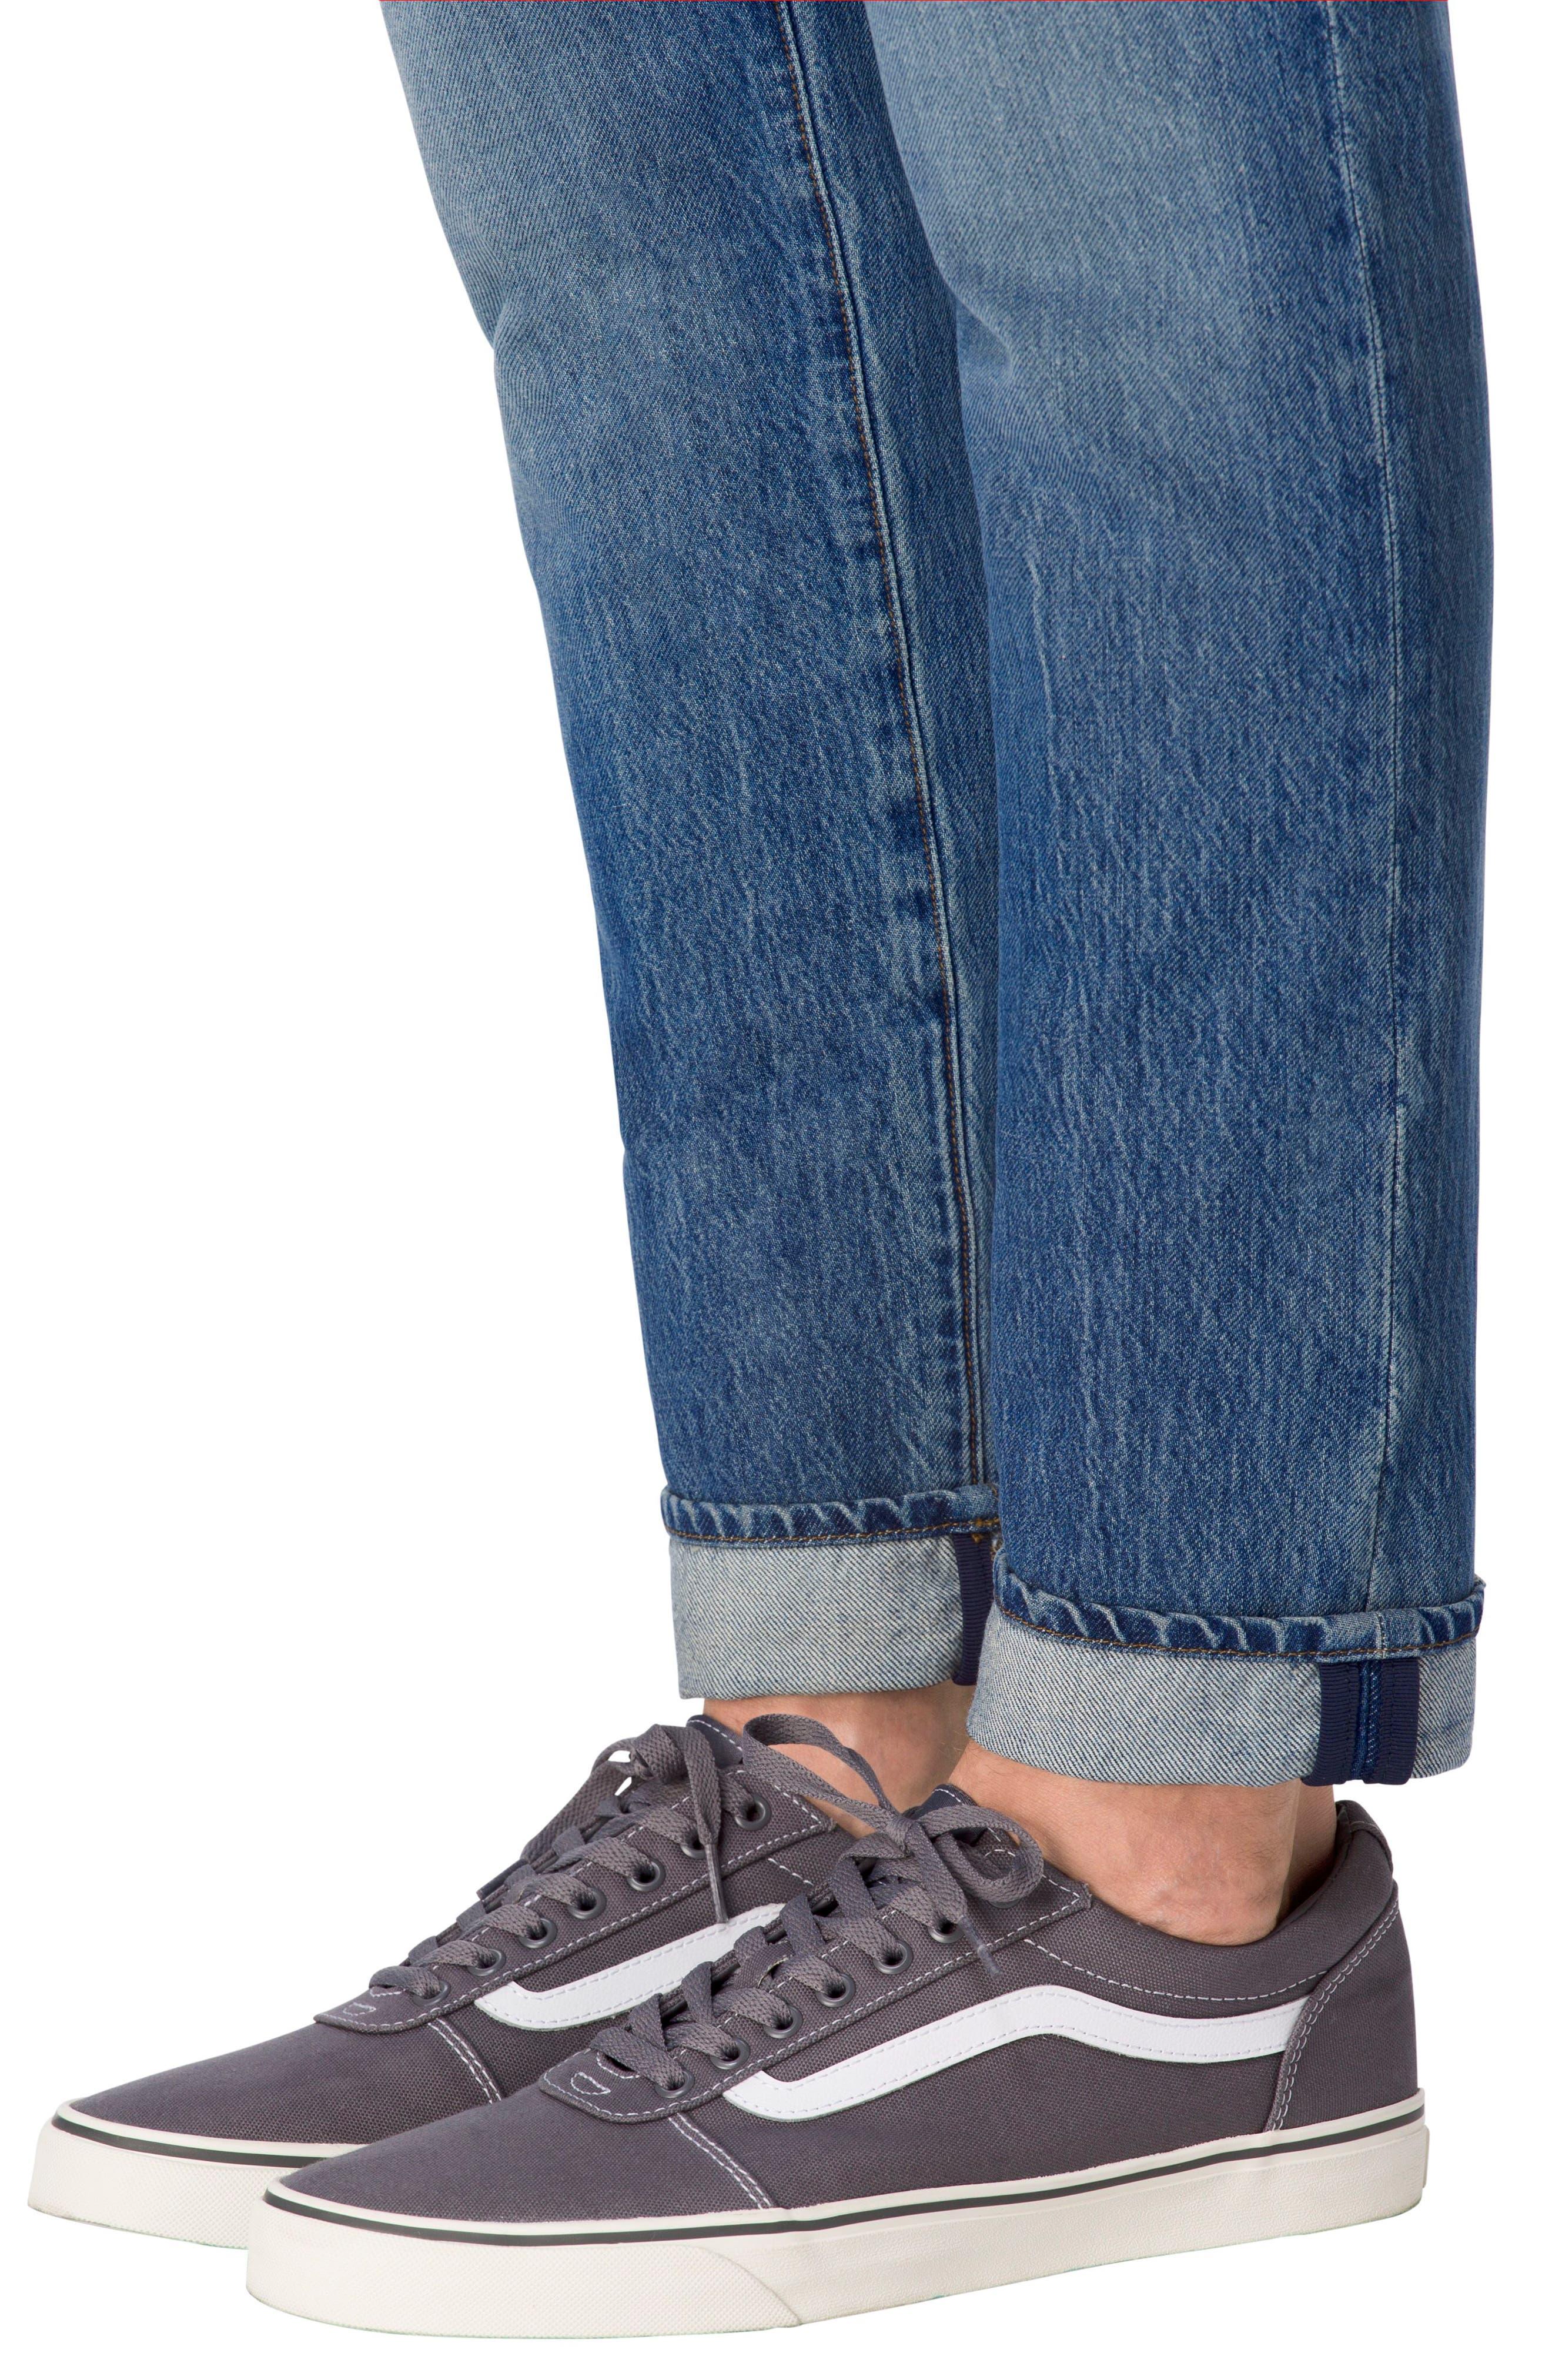 Tyler Slim Fit Jeans,                             Alternate thumbnail 4, color,                             451